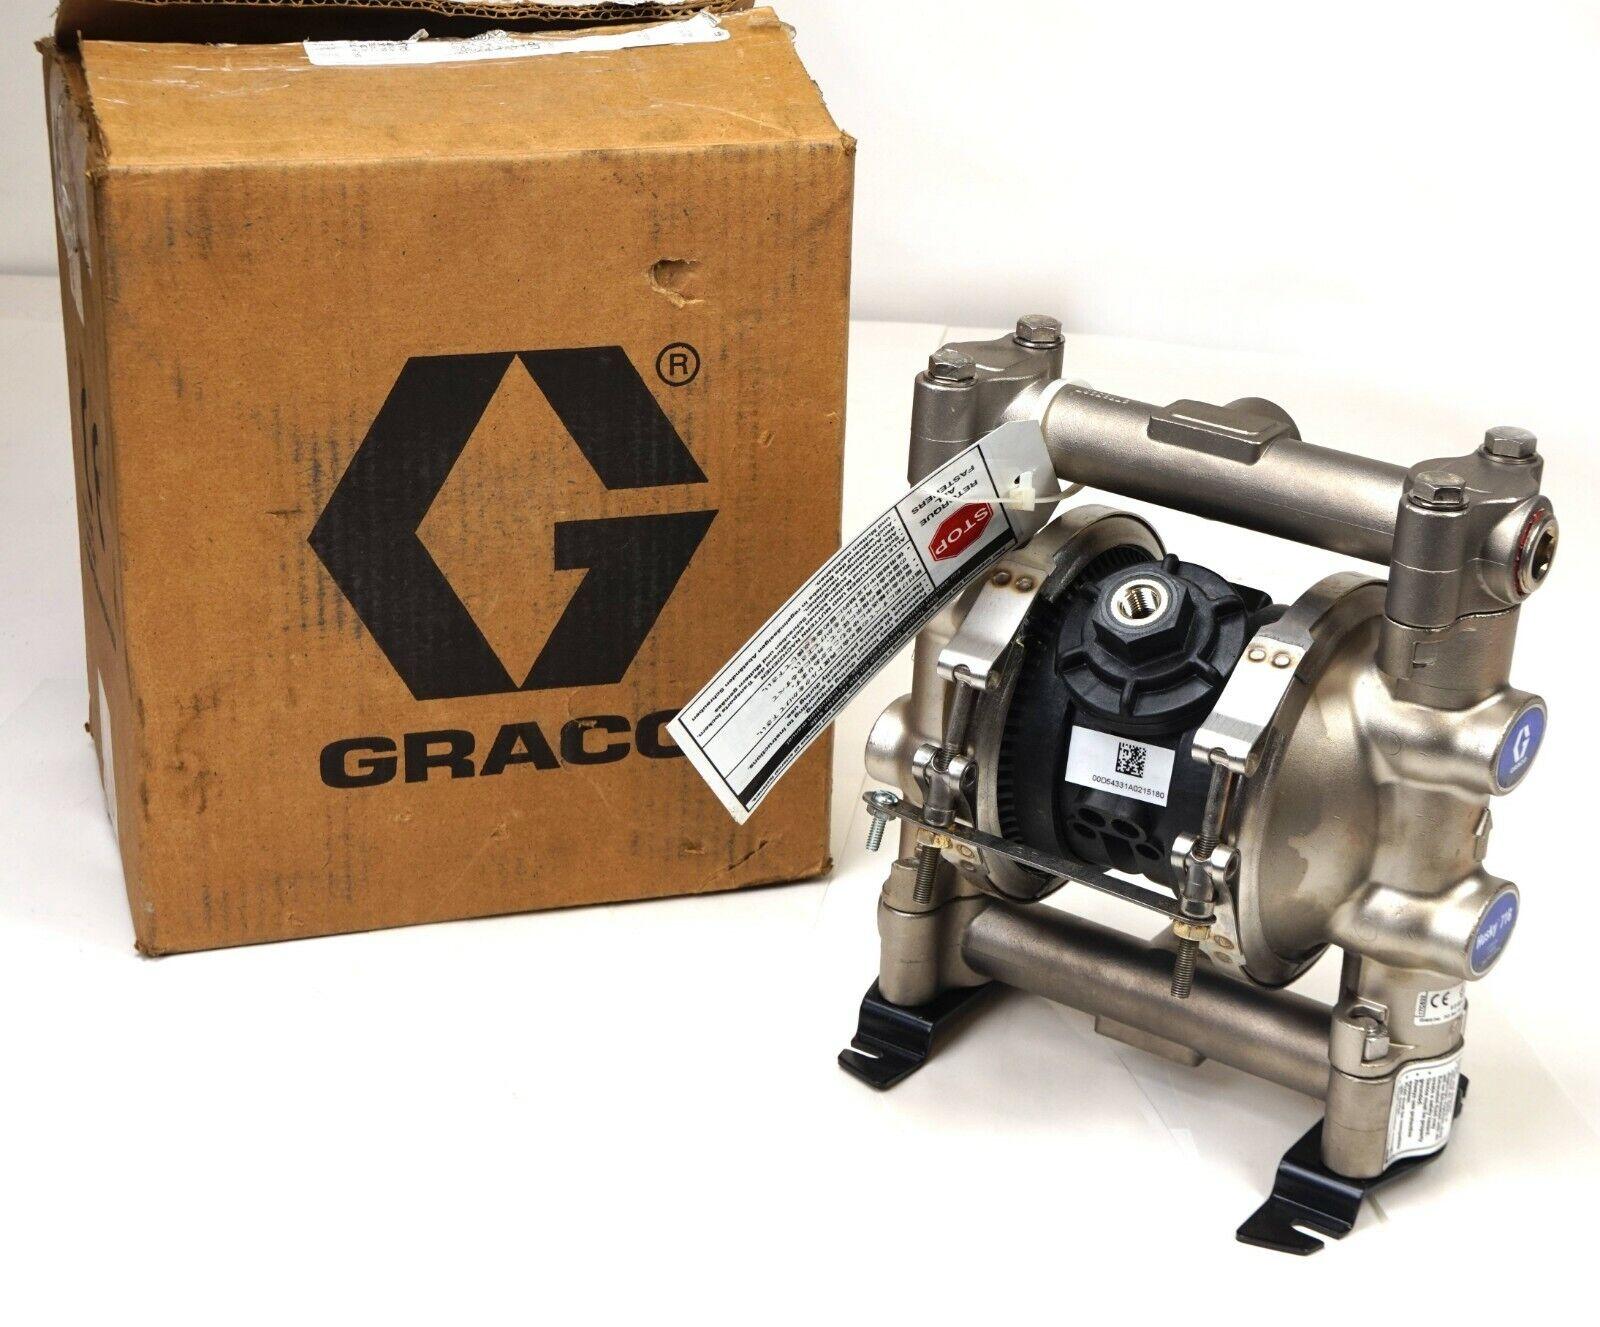 Graco 716 Pump